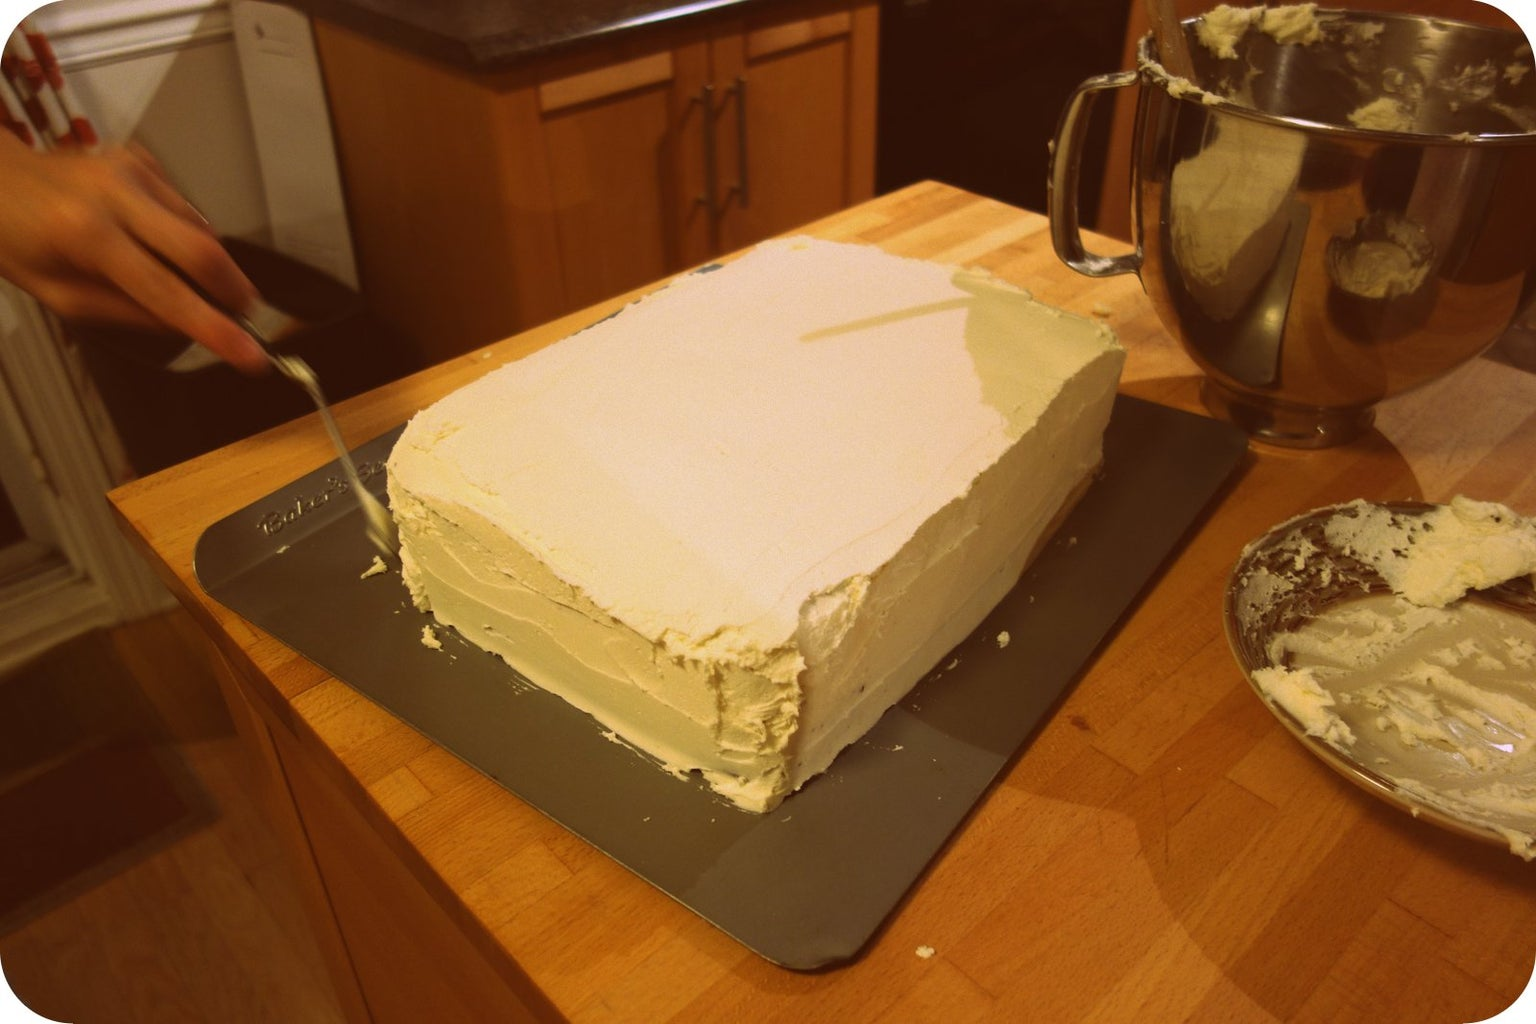 Baking the Cake